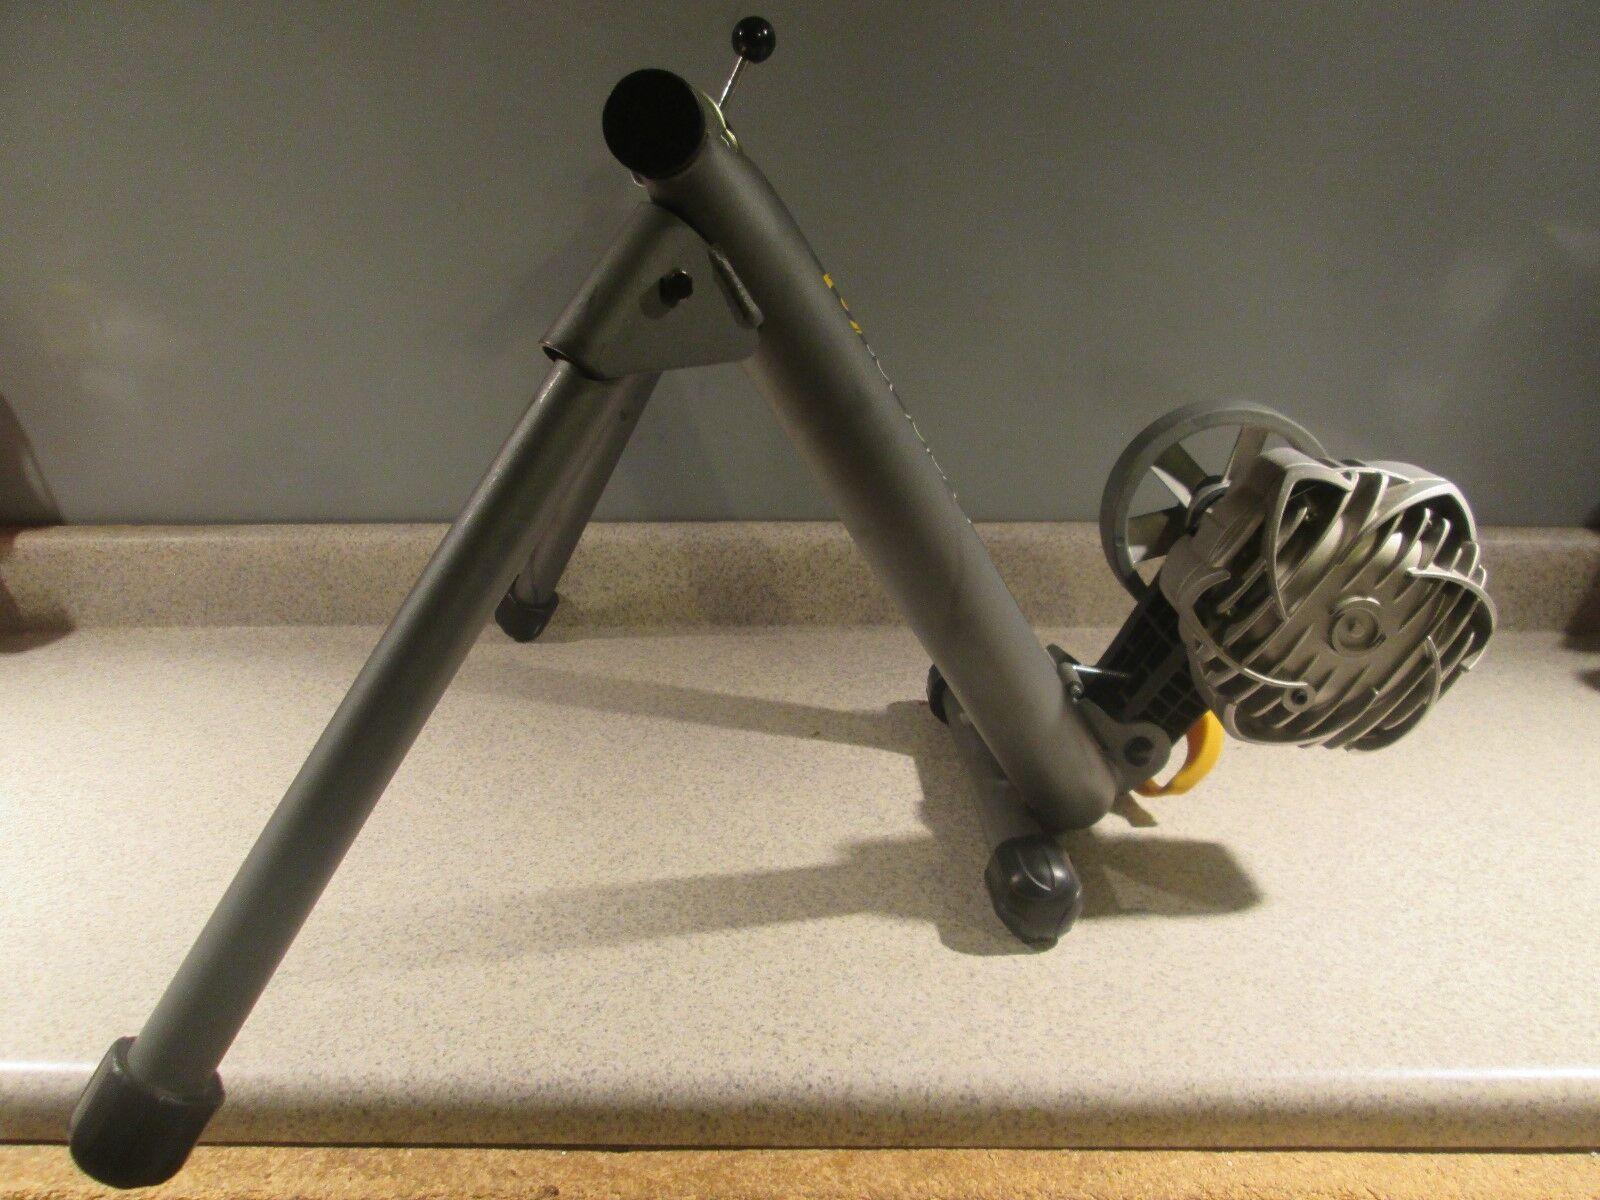 CYCLEOPS FLUID 2 9904 (NEWEST MODEL) INDOOR BICYCLE BIKE TRAINER GENTLY USED